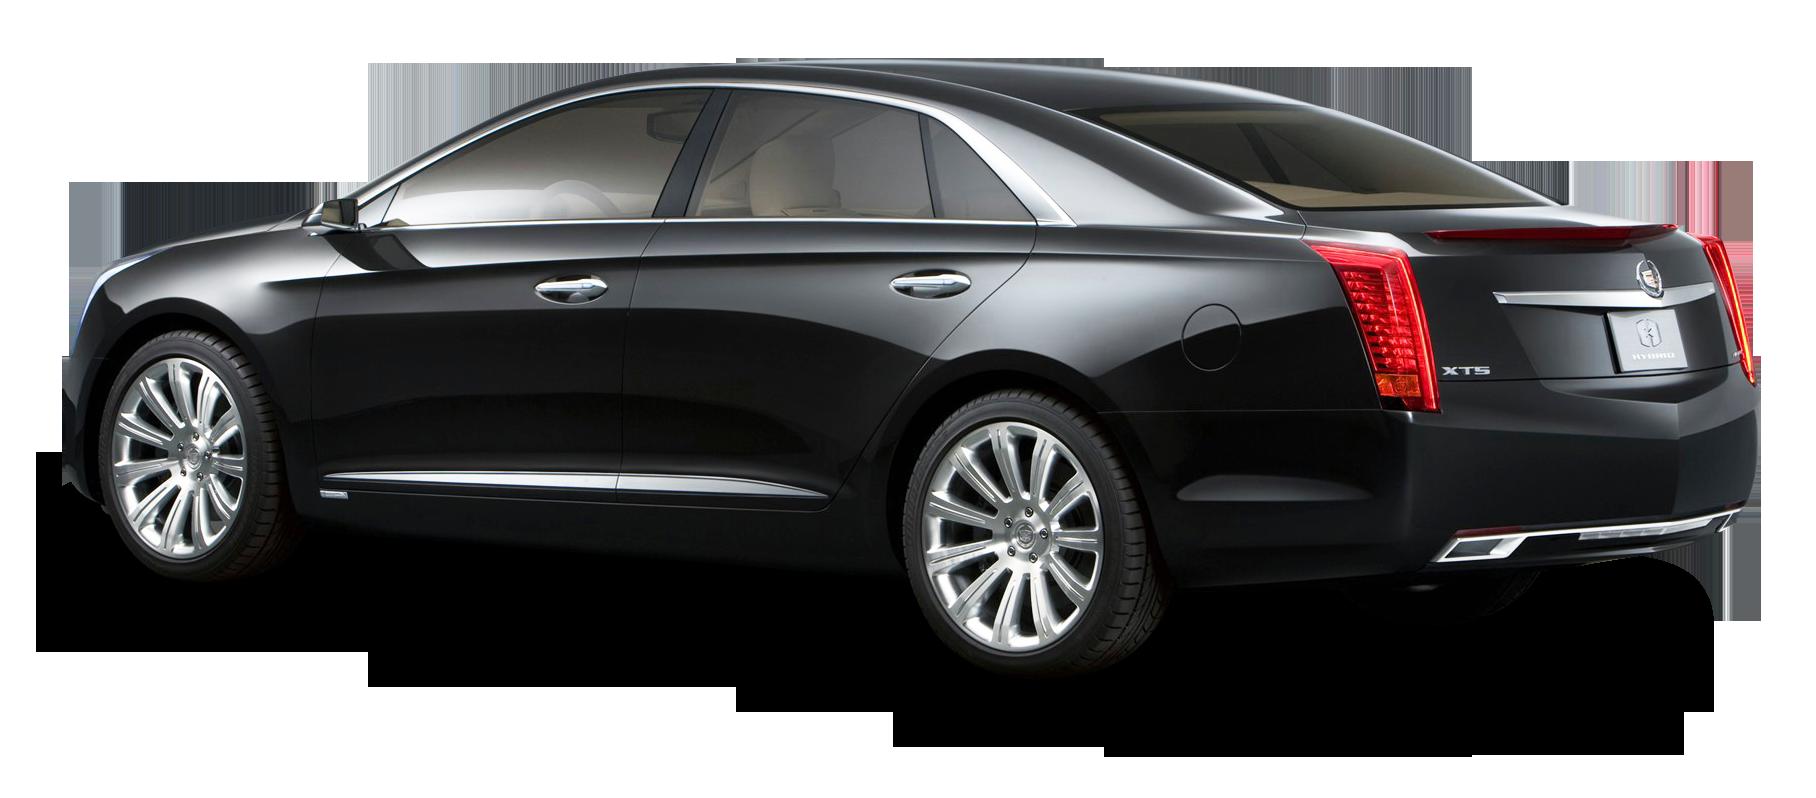 Cadillac Xts Platinum Black Luxury Car Png Image Purepng Free